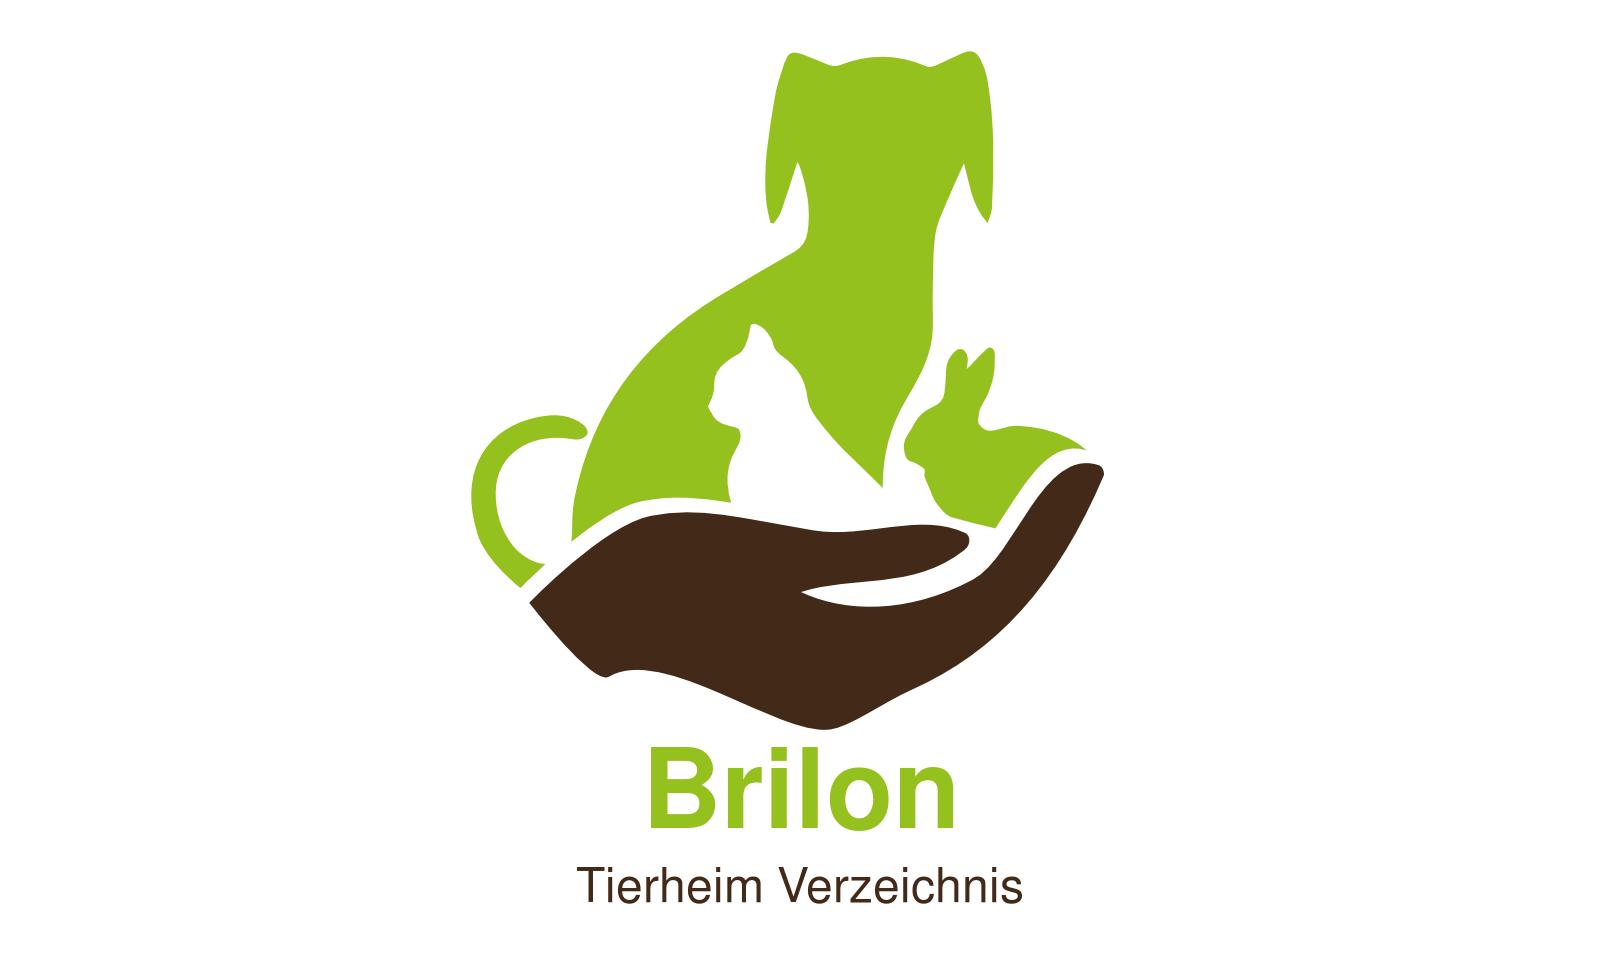 Tierheim Brilon